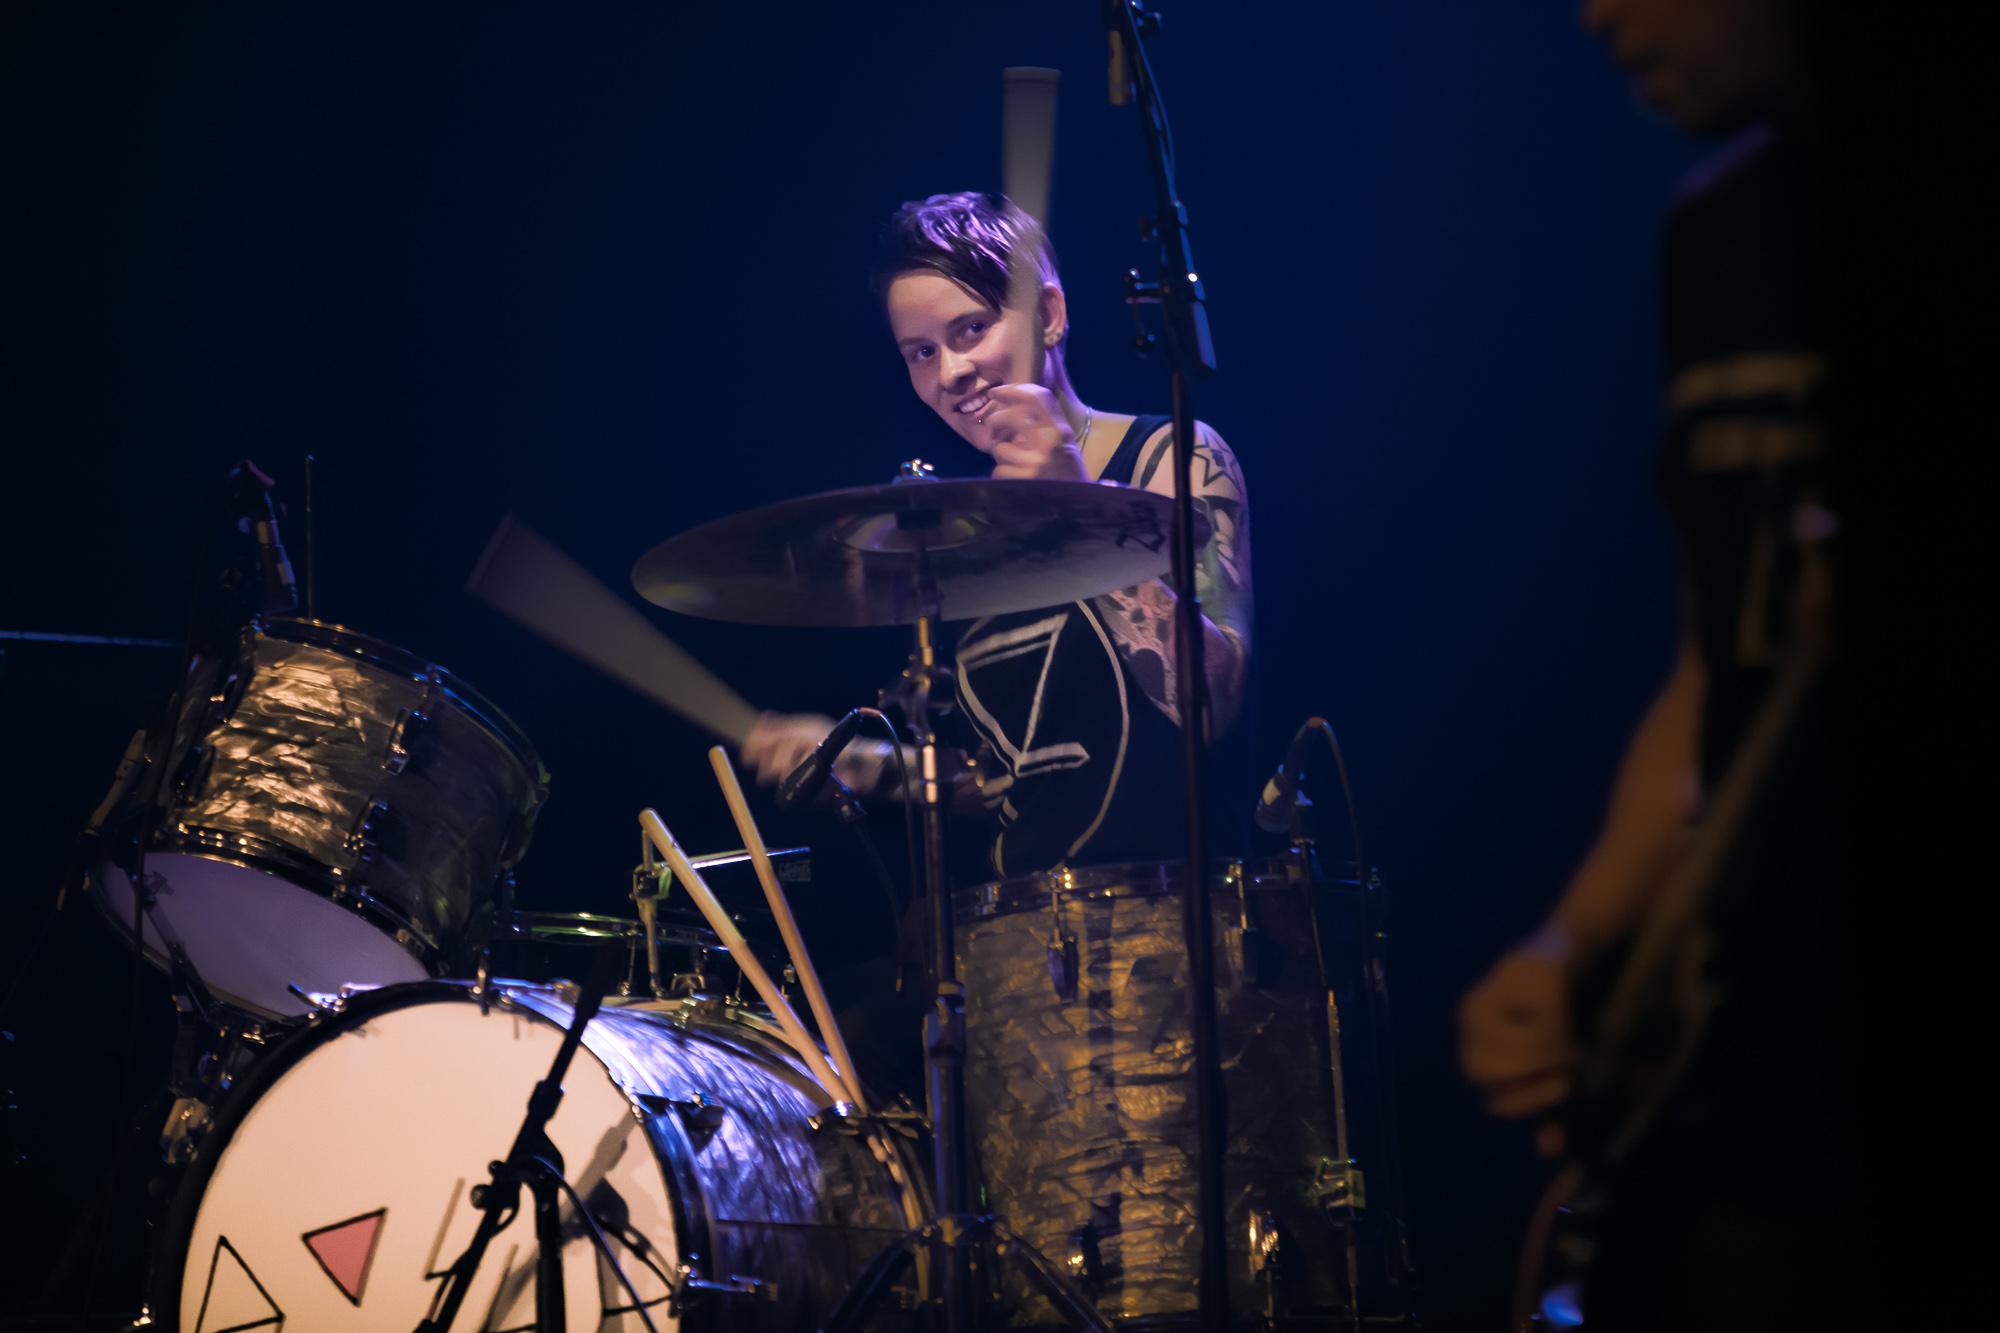 Drummer Hannah Blilie ... The Gossip (US) @ Fri-Son, Fribourg, S